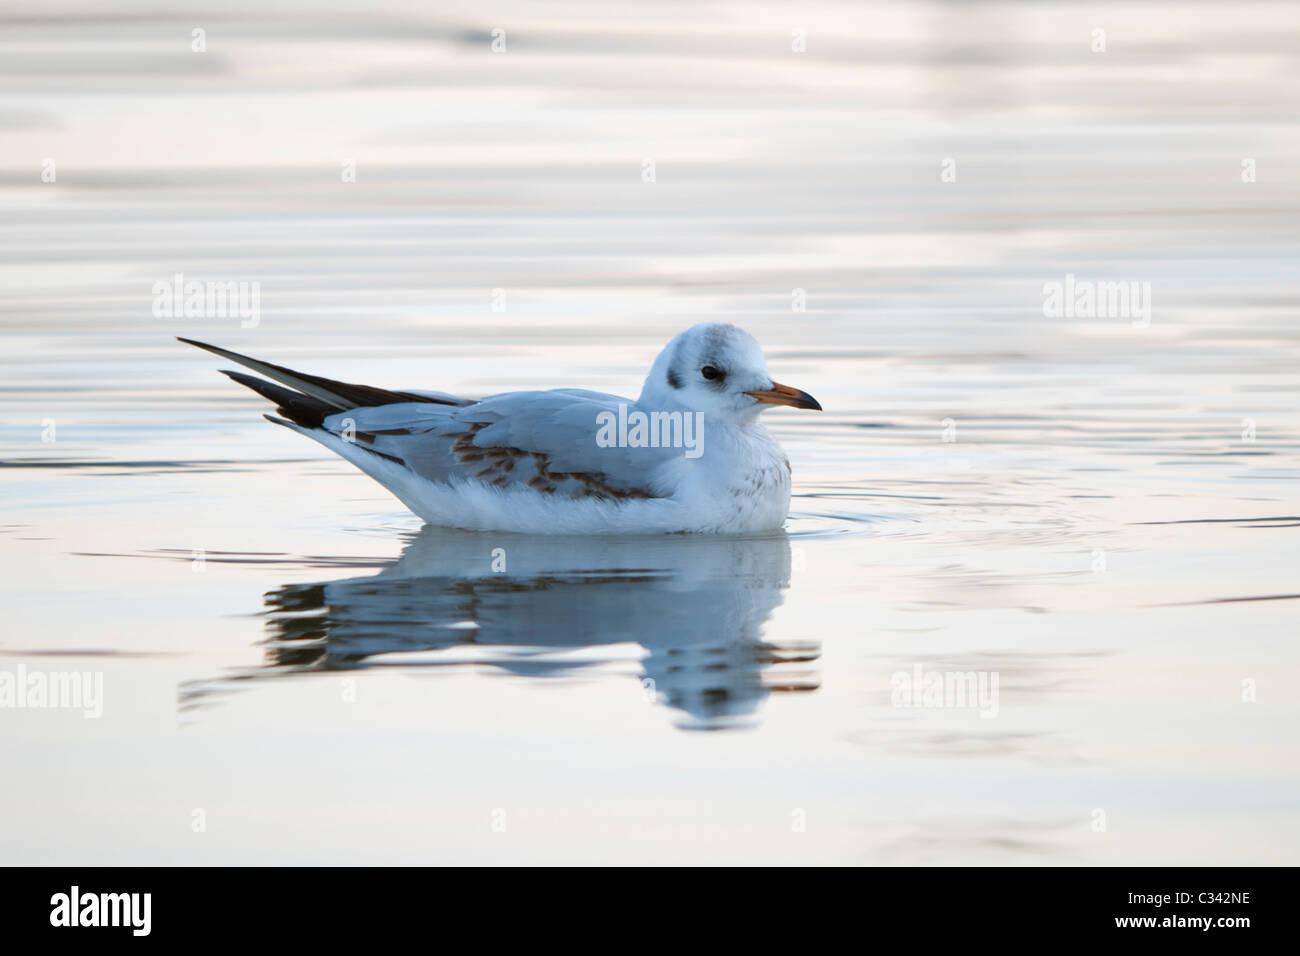 Black-headed Gull (Larus ridibundus) immature on water - Stock Image